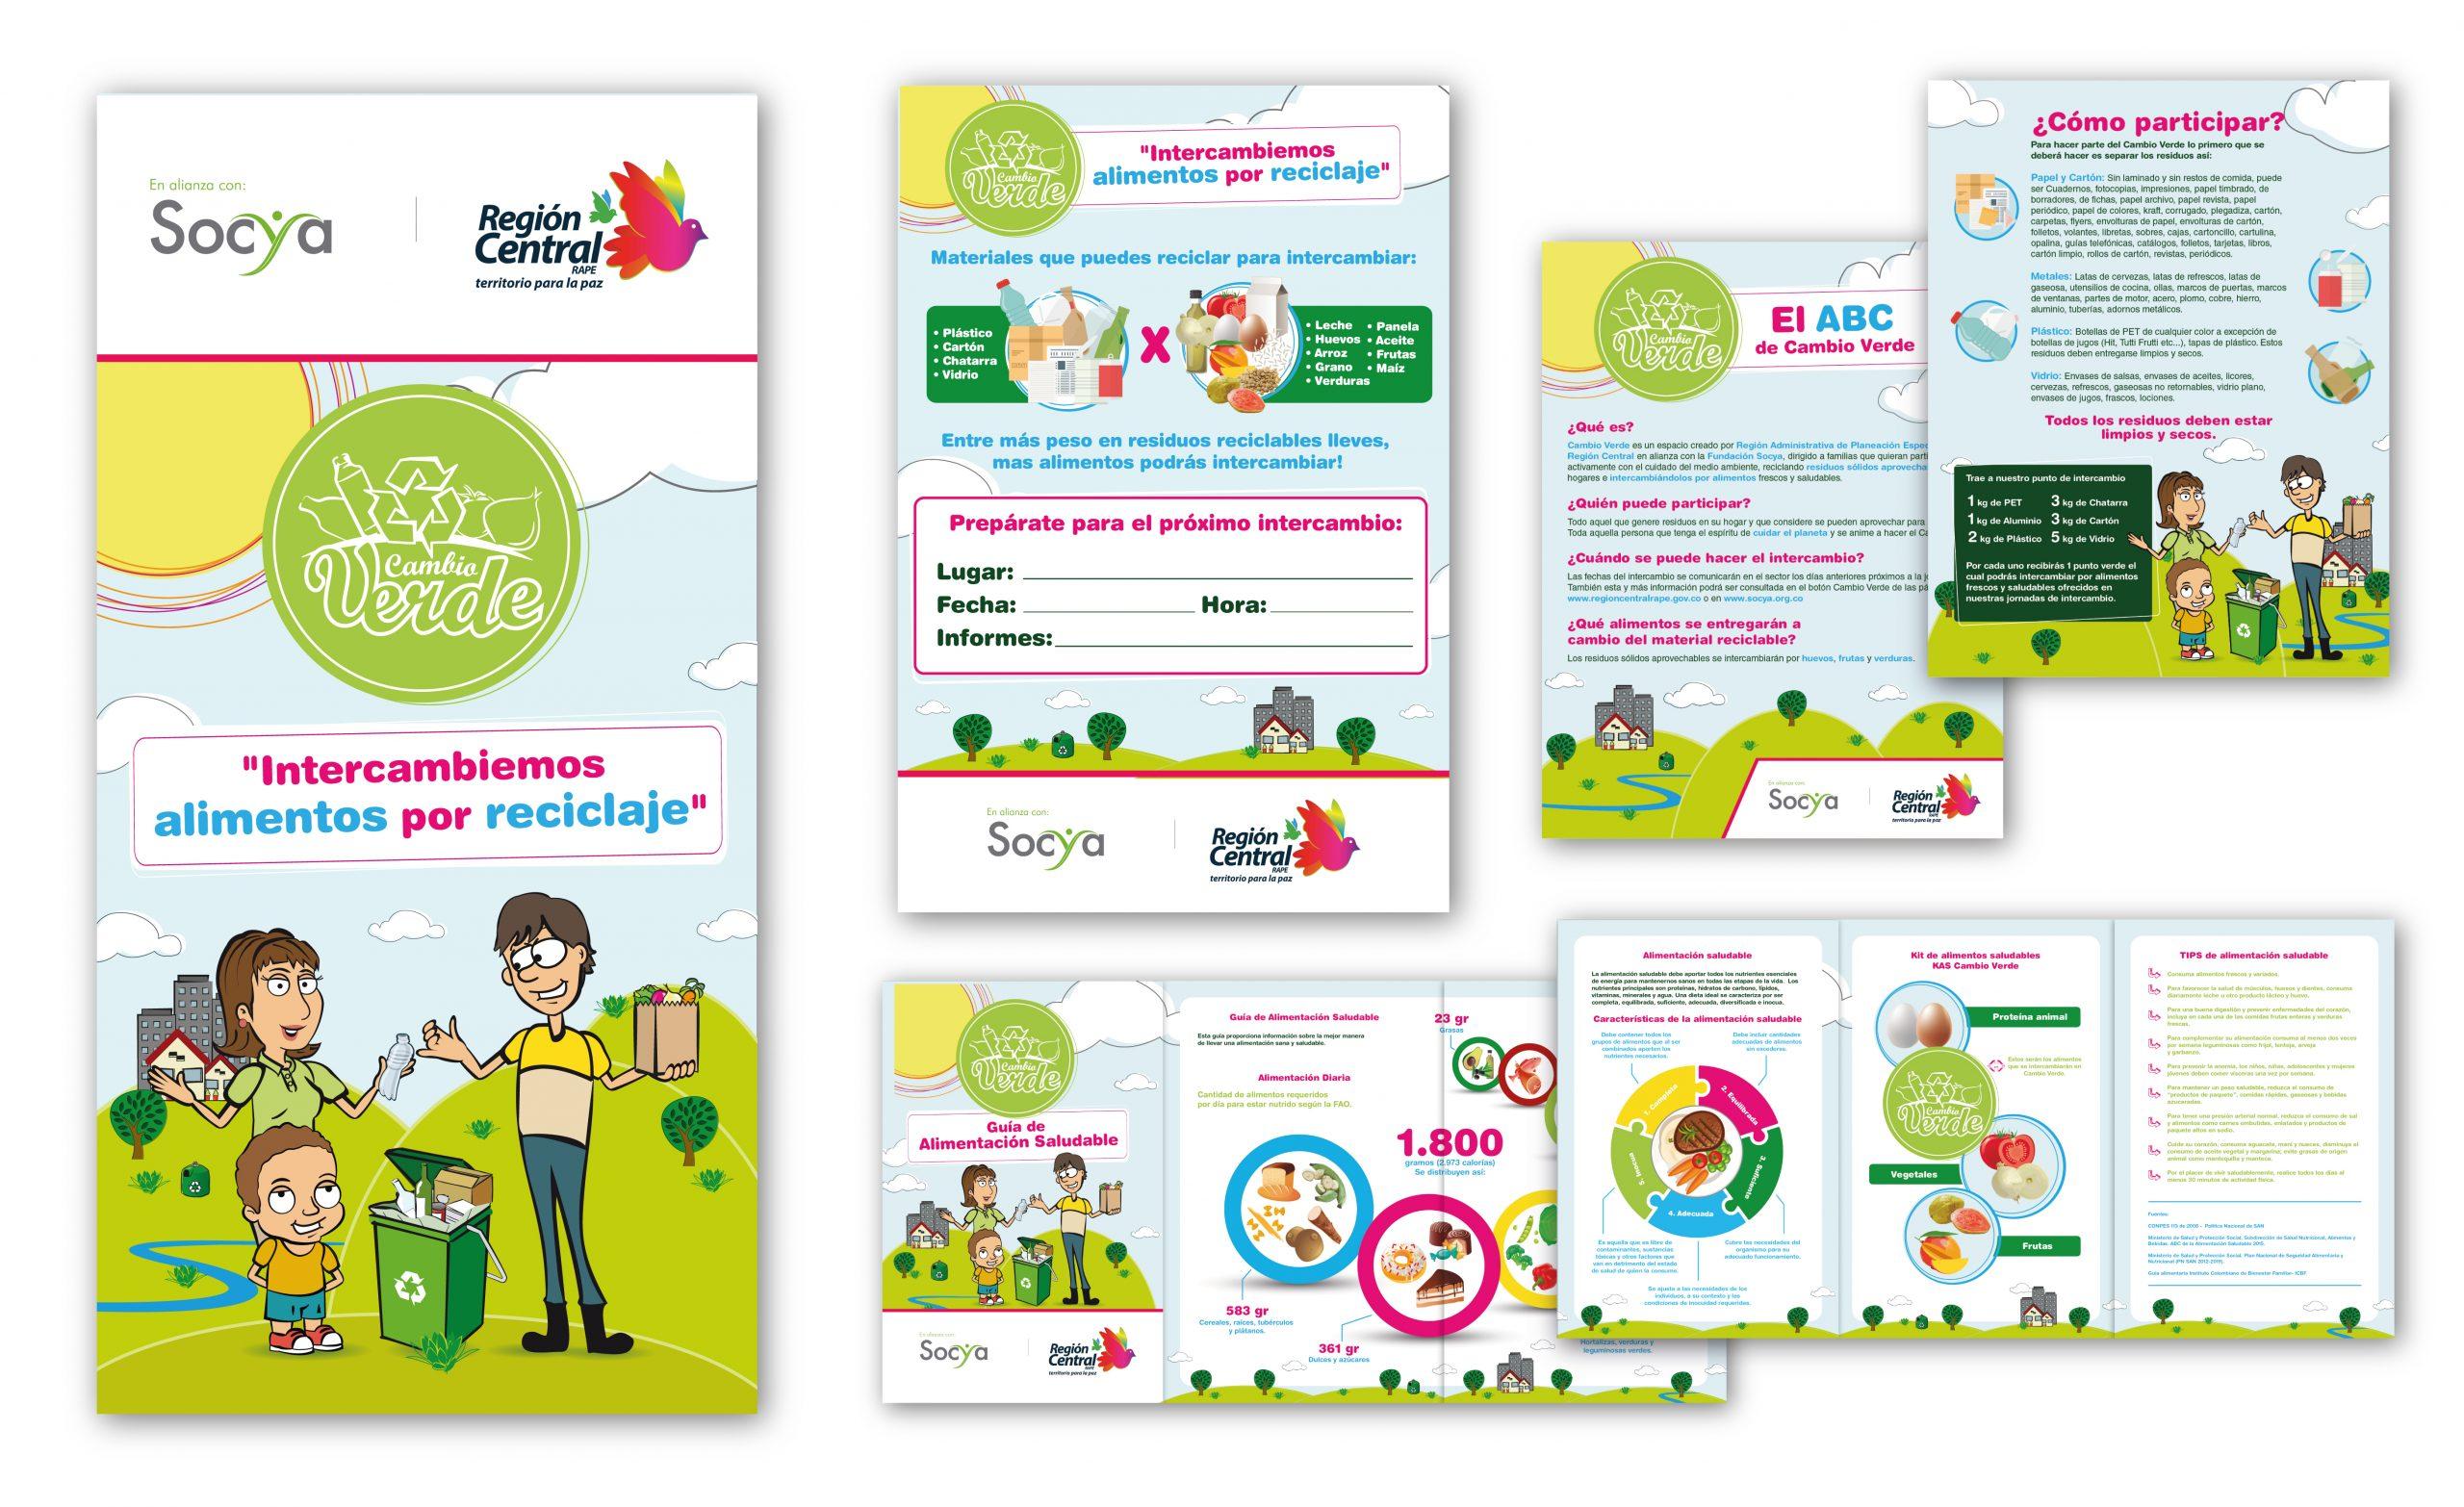 Cambio Verde Campaign